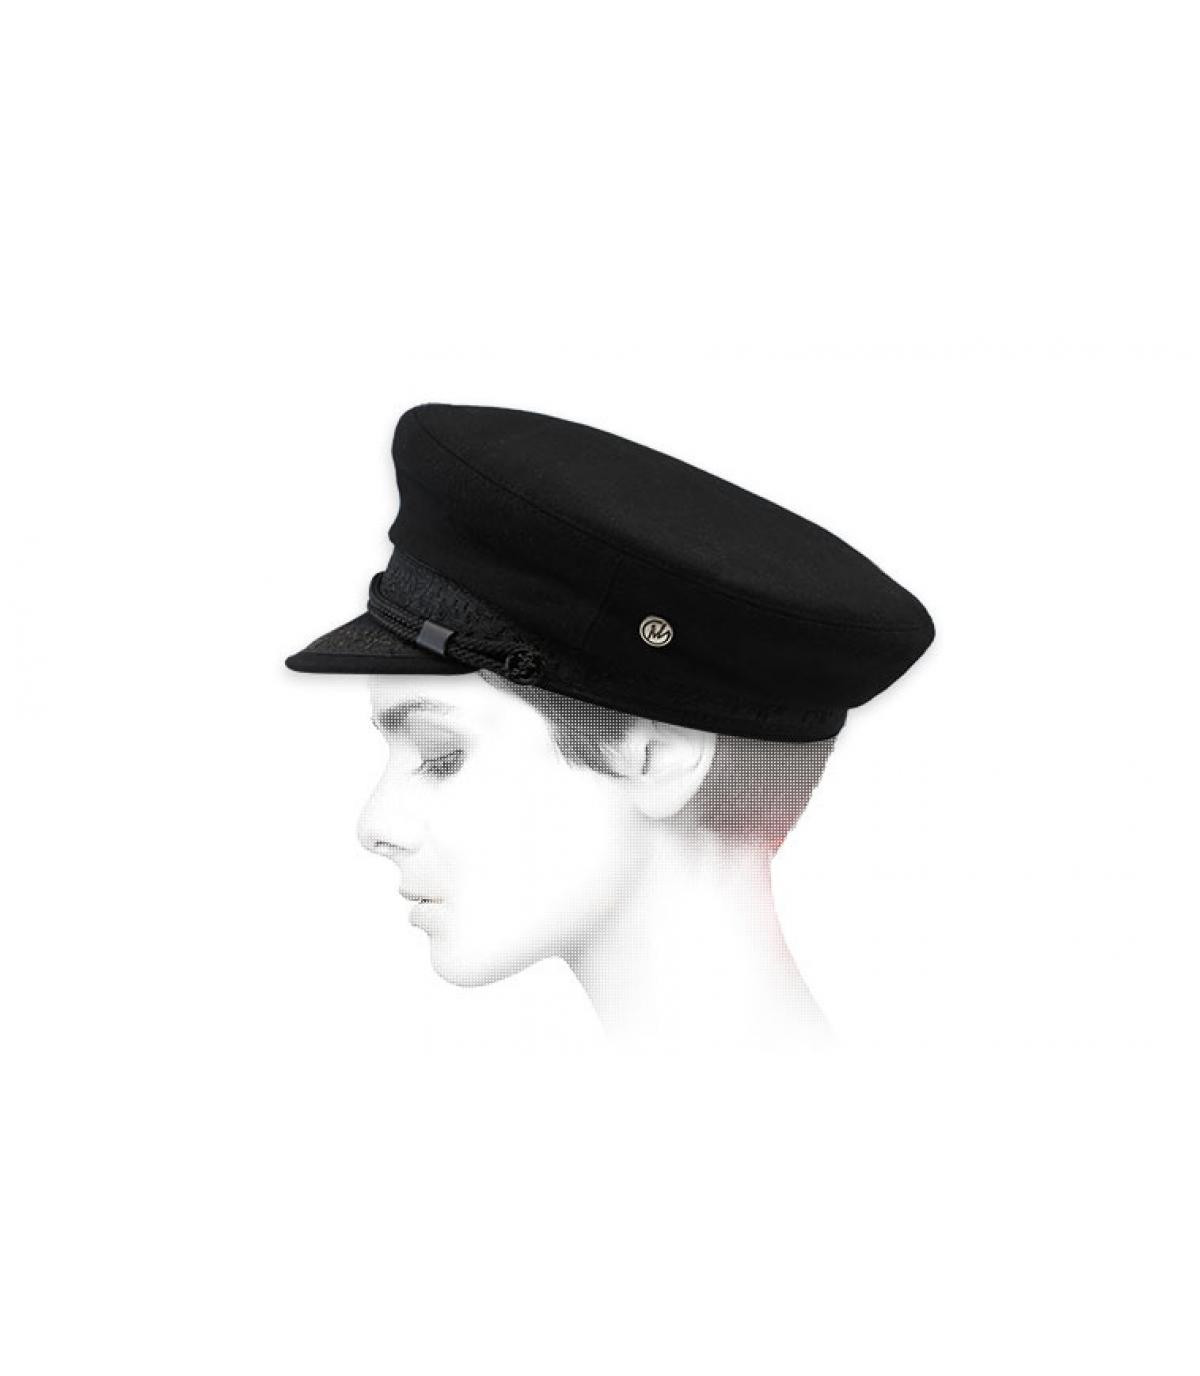 gorra marinera negro lana